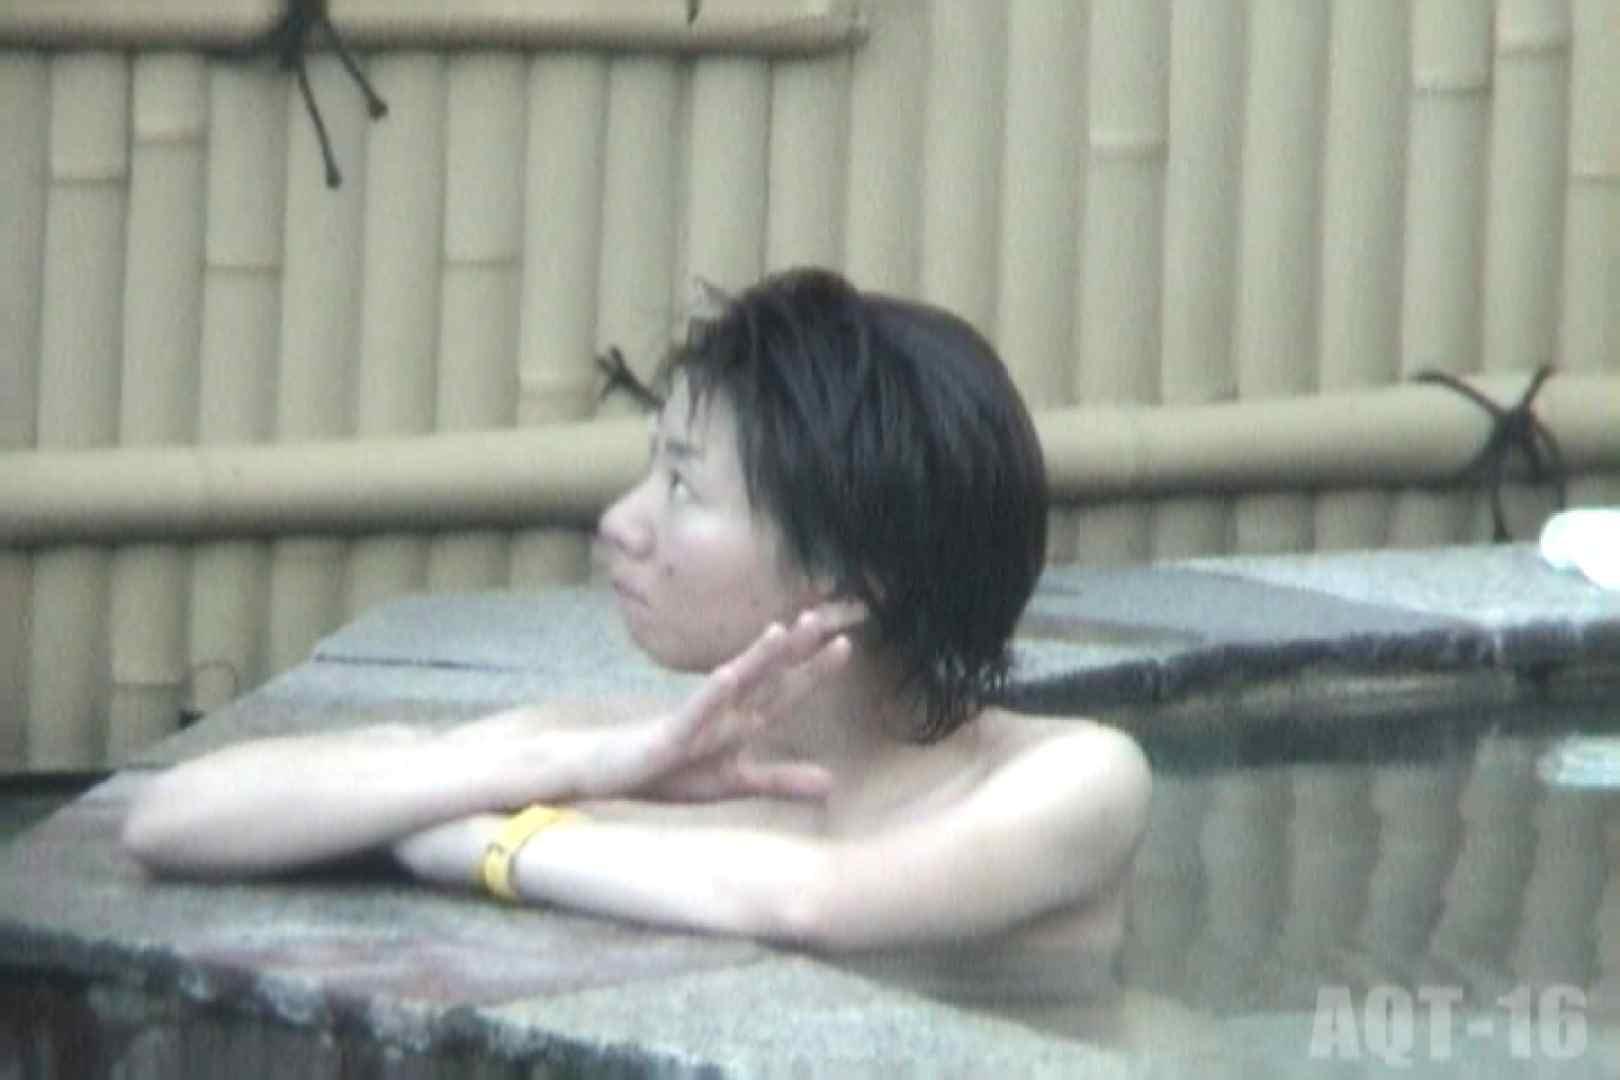 Aquaな露天風呂Vol.842 露天風呂突入 AV動画キャプチャ 96pic 8